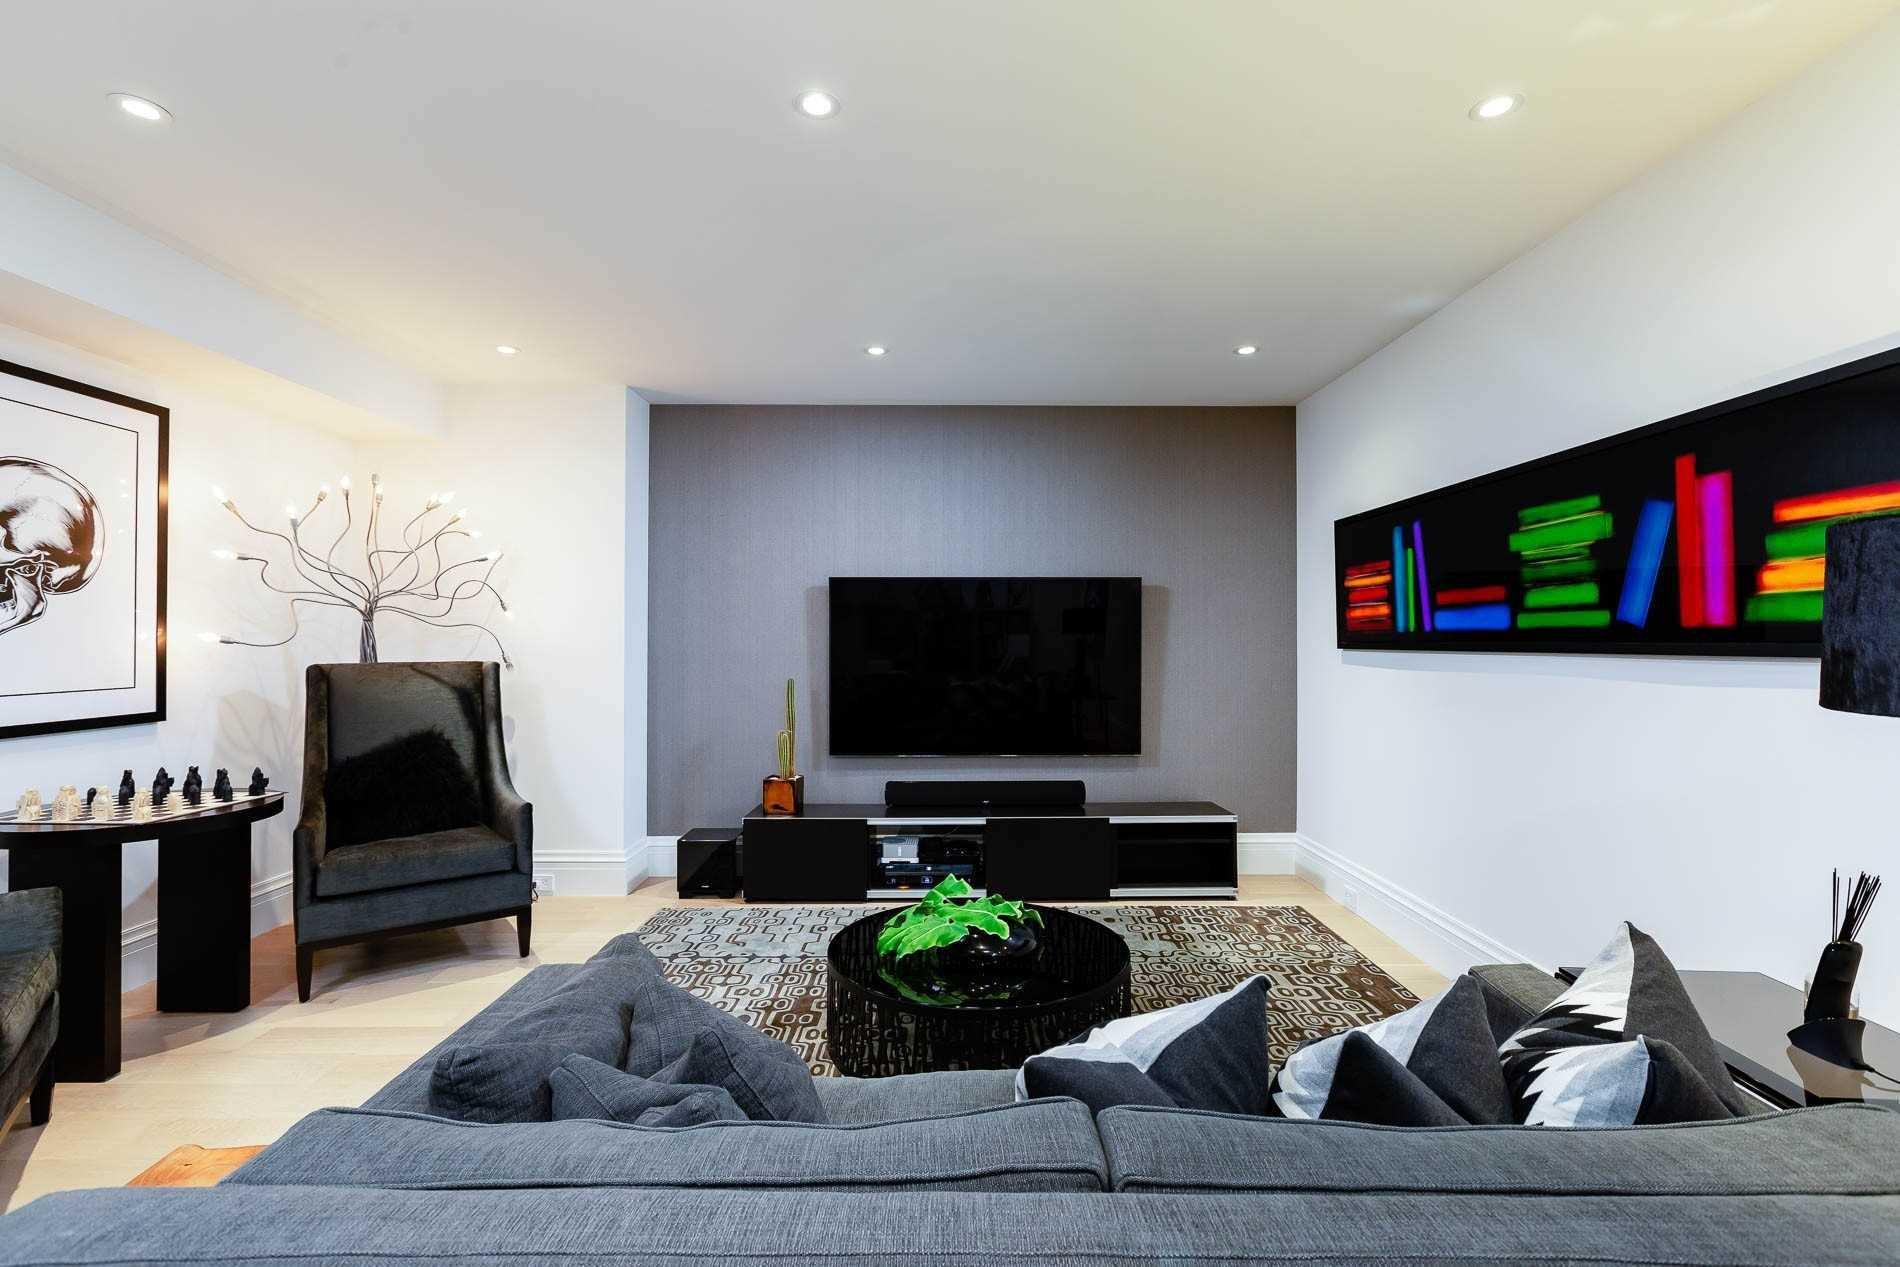 Photo 18: Photos: 45 Admiral Road in Toronto: Annex House (3-Storey) for sale (Toronto C02)  : MLS®# C4612730